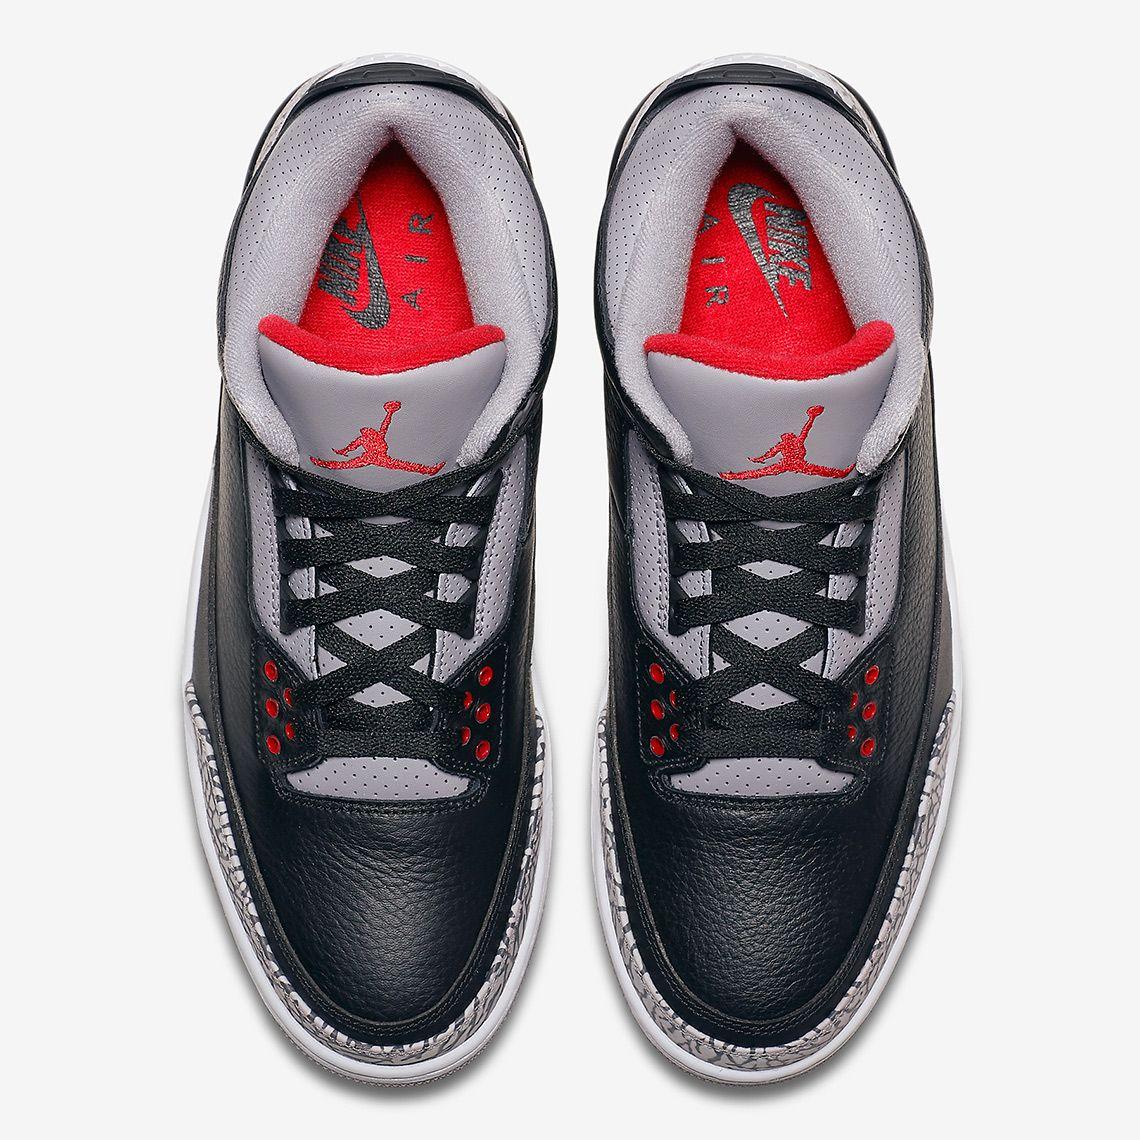 huge selection of 5fb2e 93ba1 Jordan 3 Black Cement Official Images - 2018 Release Info ...